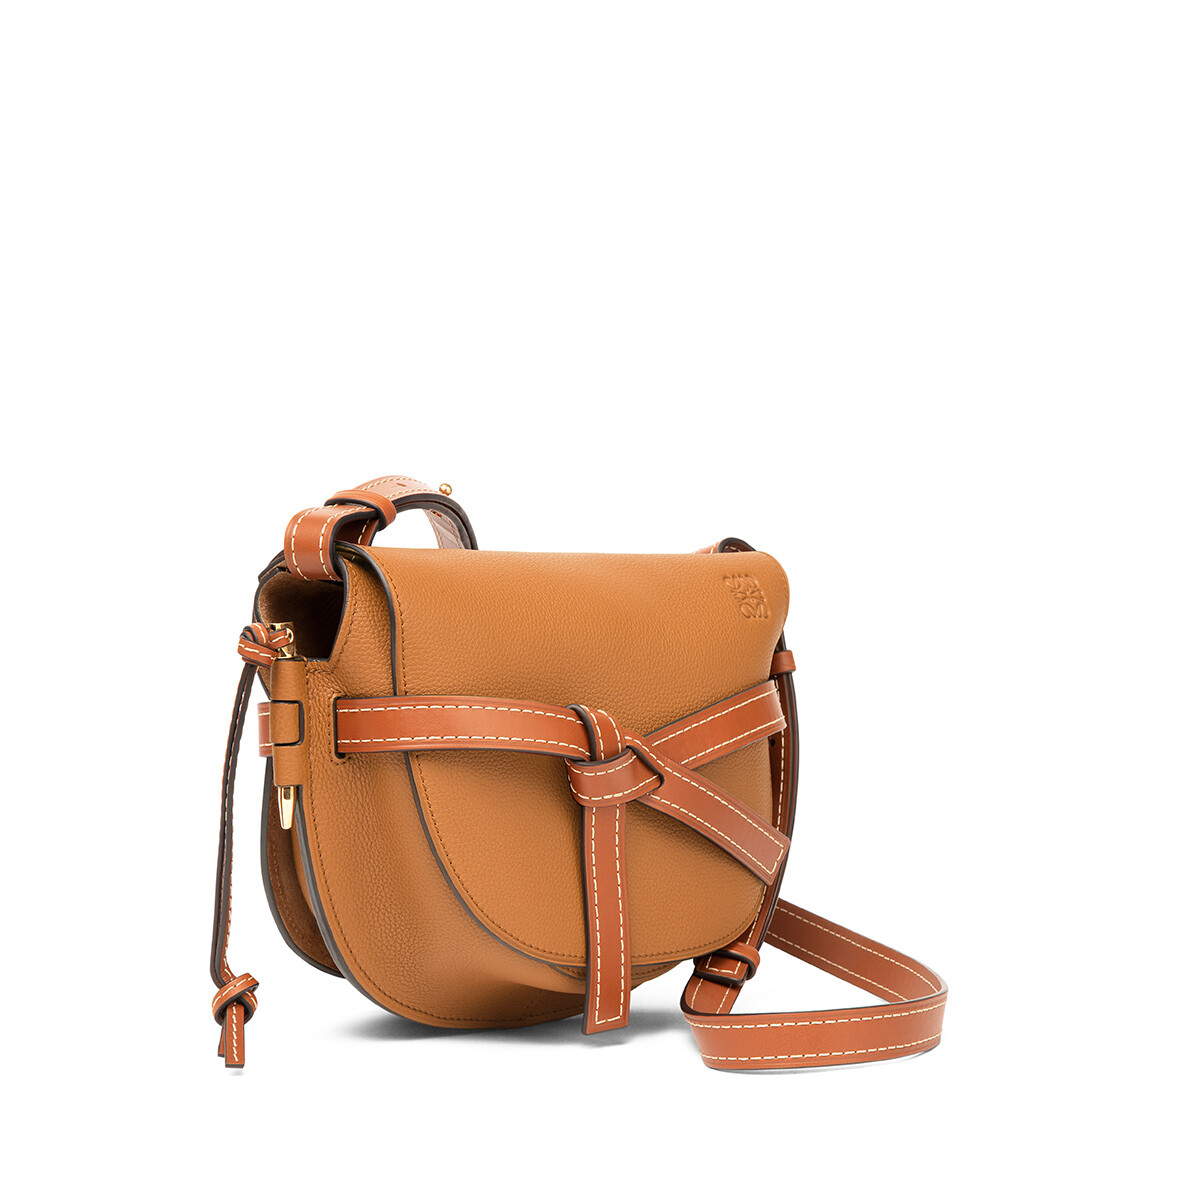 LOEWE Gate Small Bag Light Caramel/Pecan front